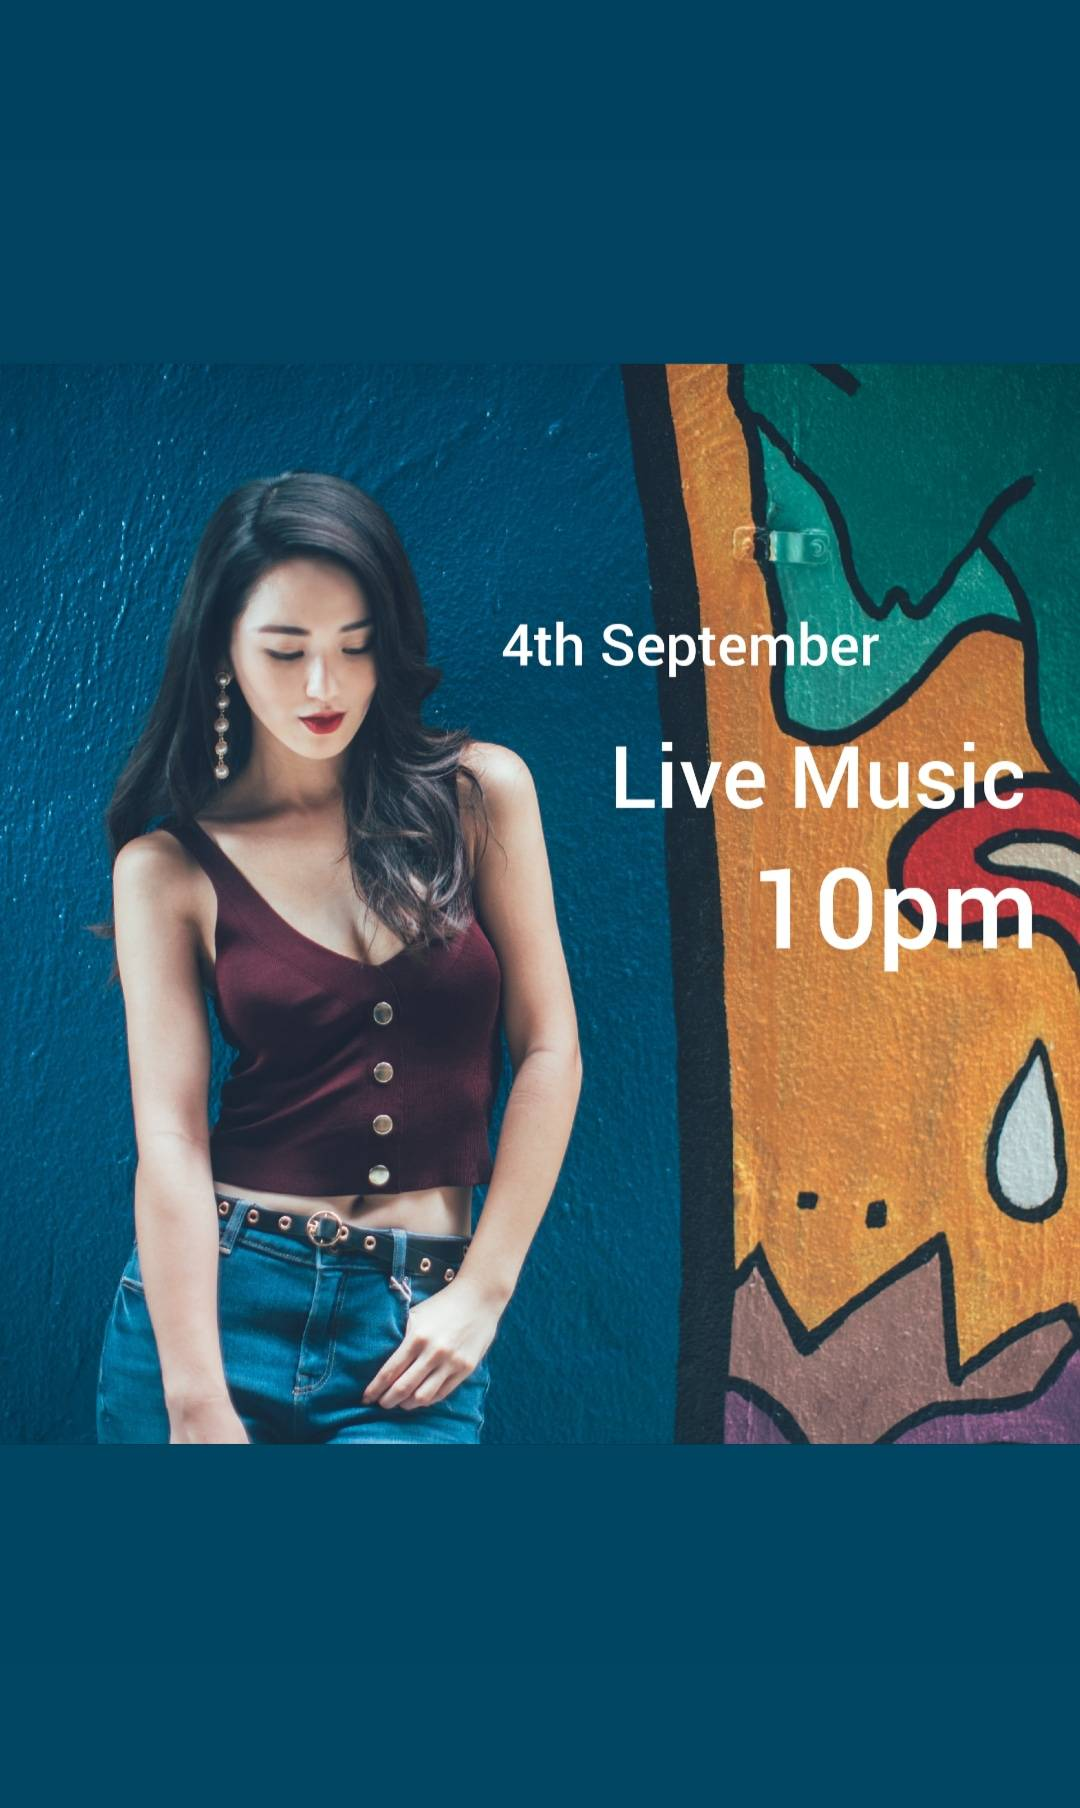 明晚10pm,我們又有live band music, 一齊來唱歌。